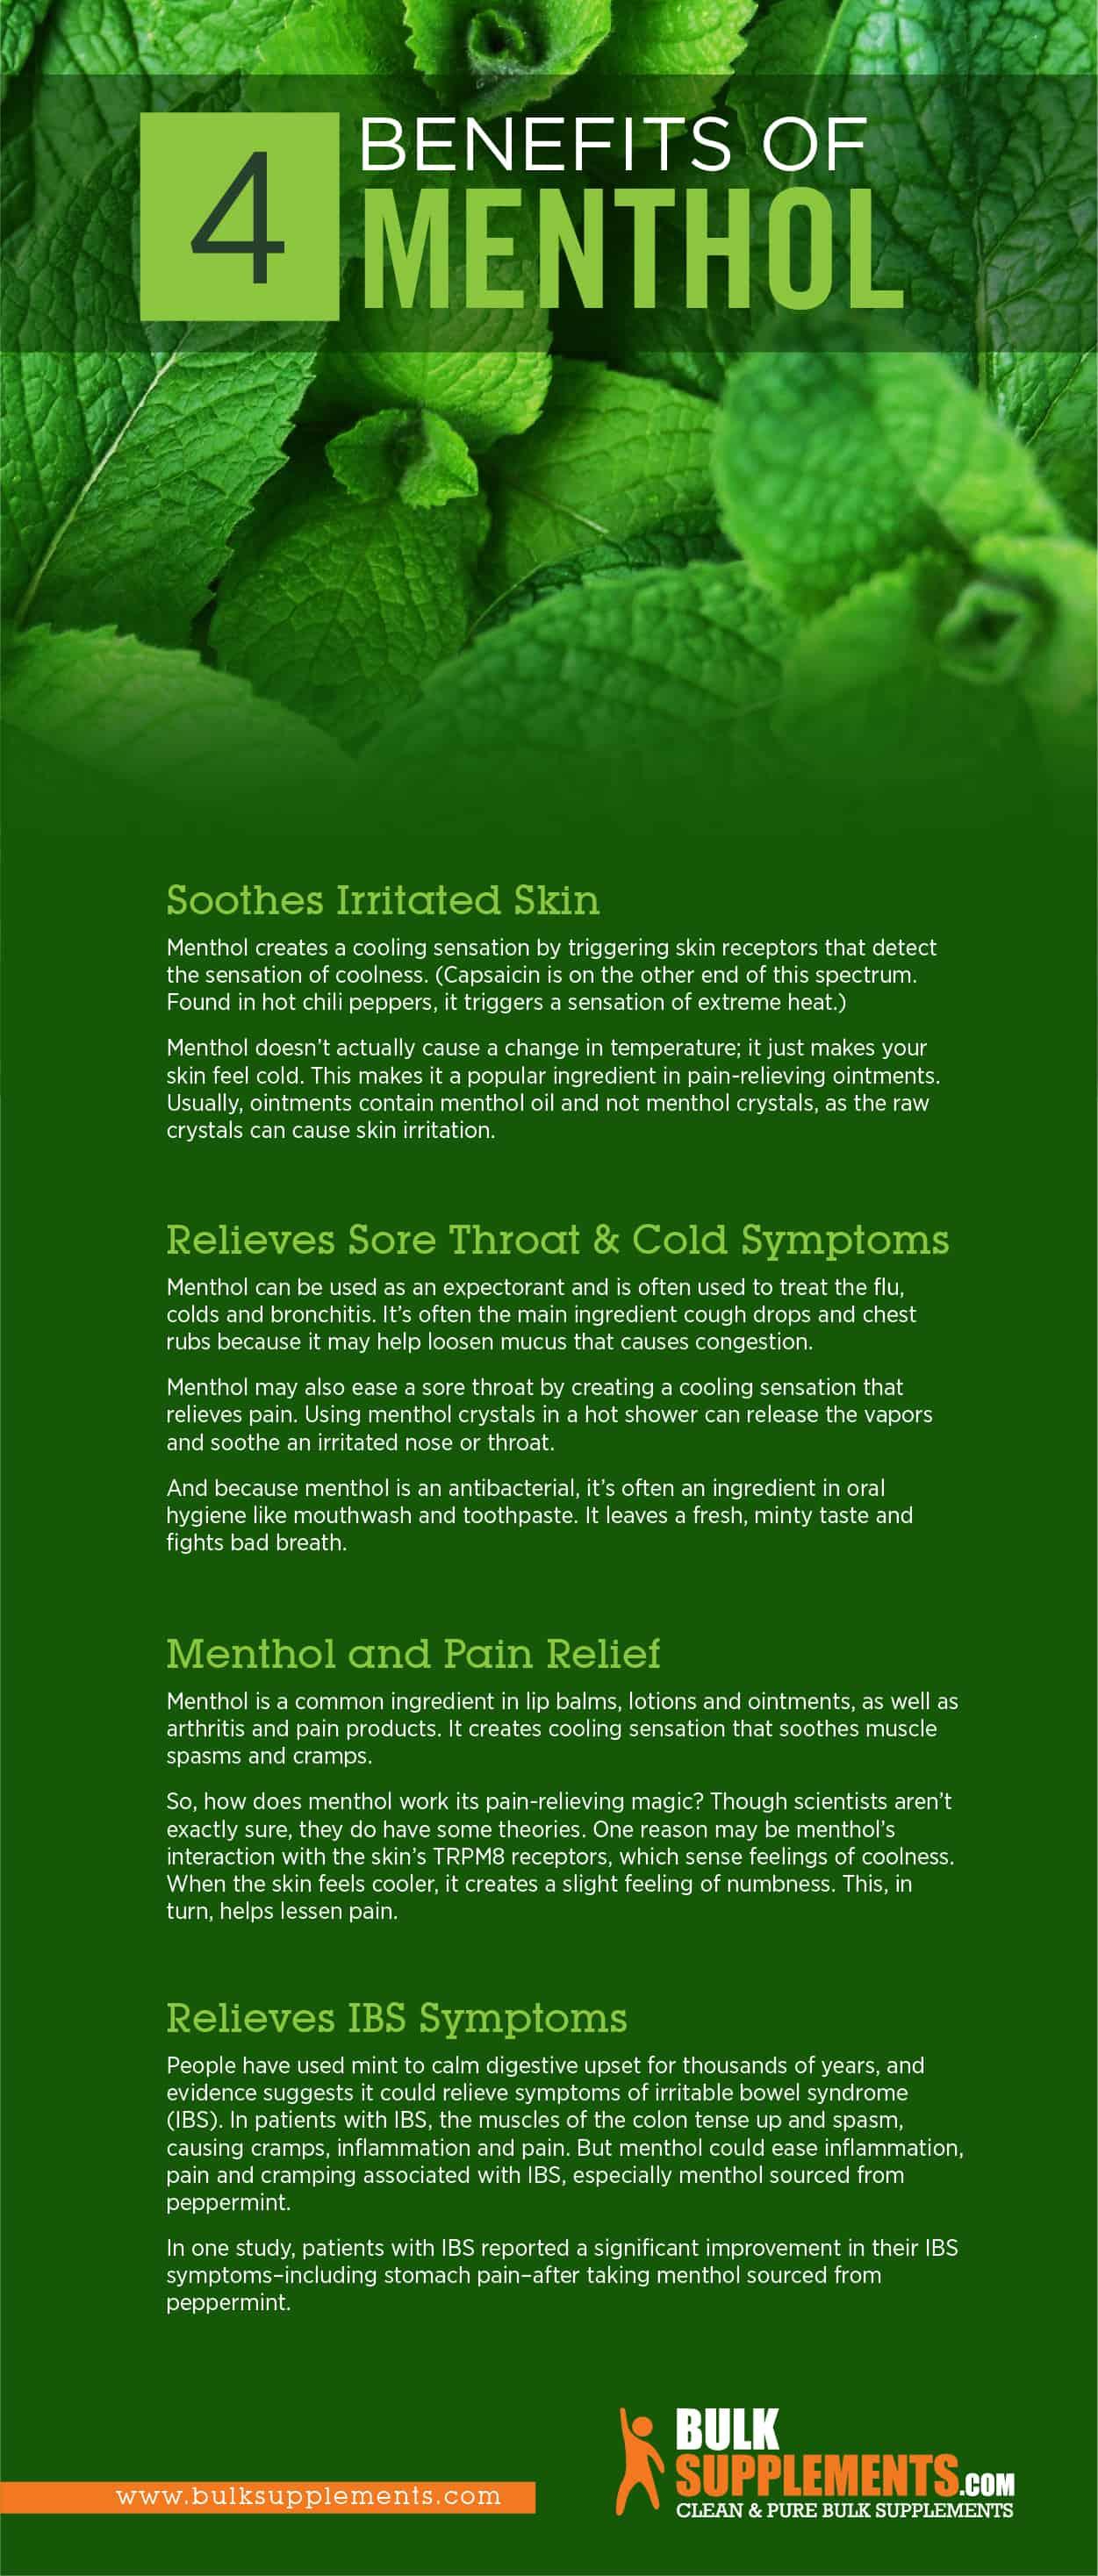 Menthol Infographic